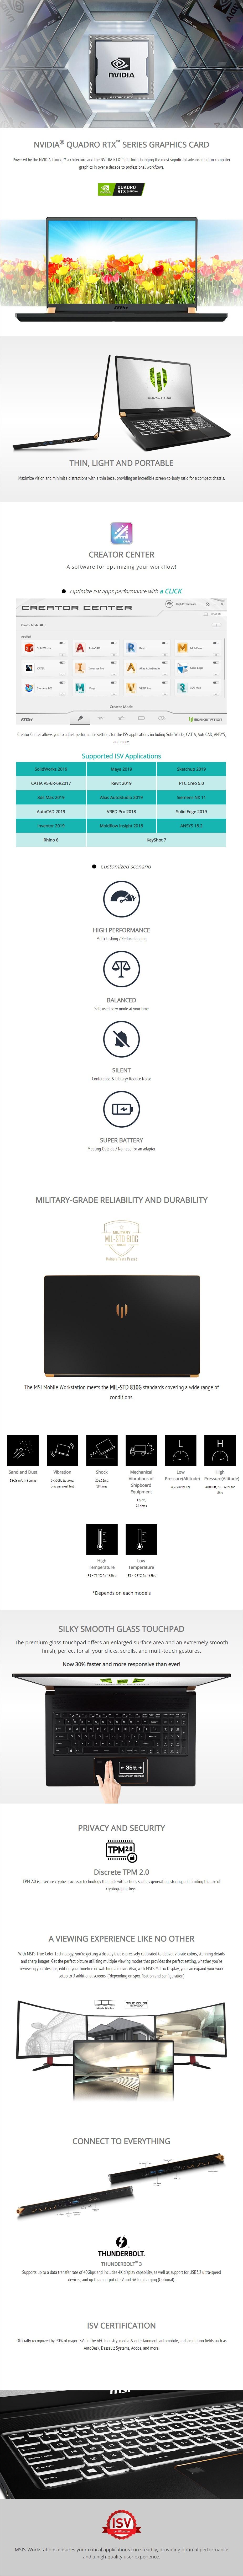 "MSI WS75 17.3"" Mobile Workstation i7-9750H 32GB 1TB Quadro RTX 3000 W10P - Overview 1"